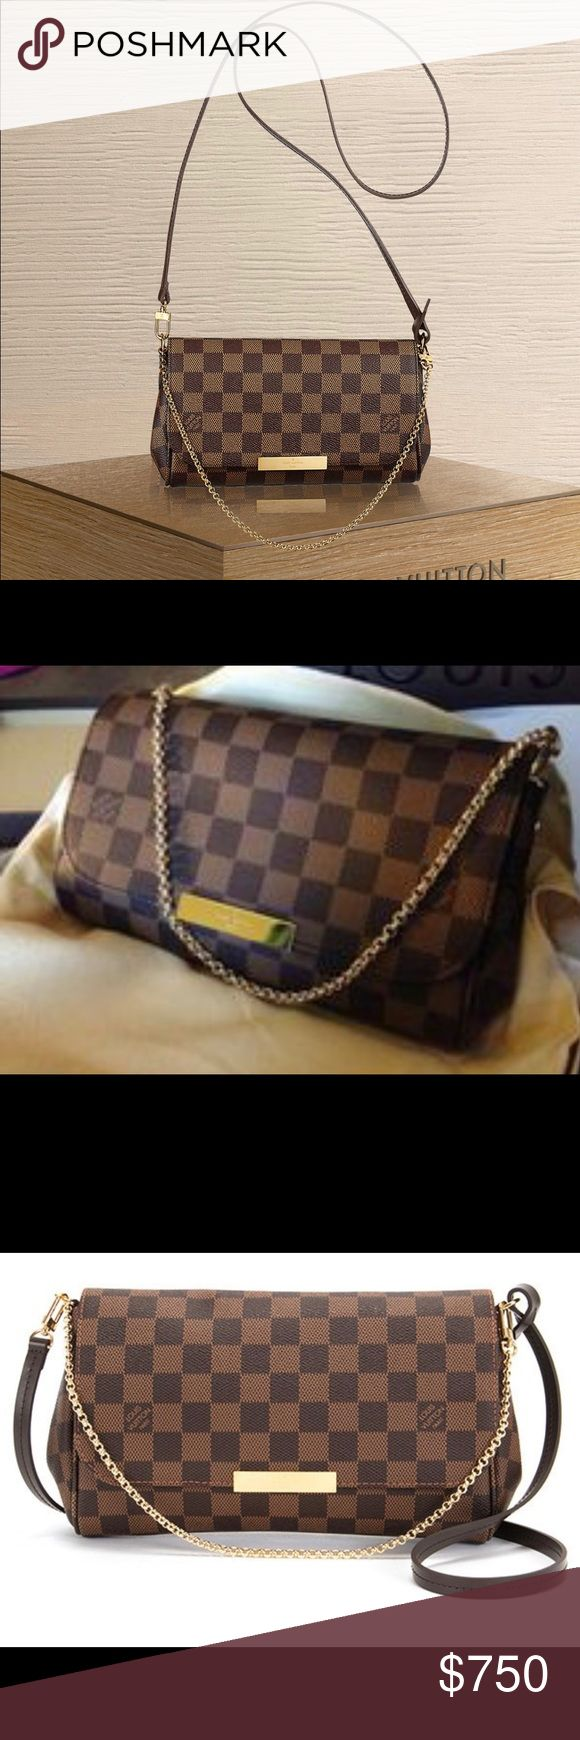 Louis Vuitton Handbag Brand New FAVORITE PM N41276  The versatile Pochette Favorite looks delightful in Damier canvas. Louis Vuitton Bags Crossbody Bags